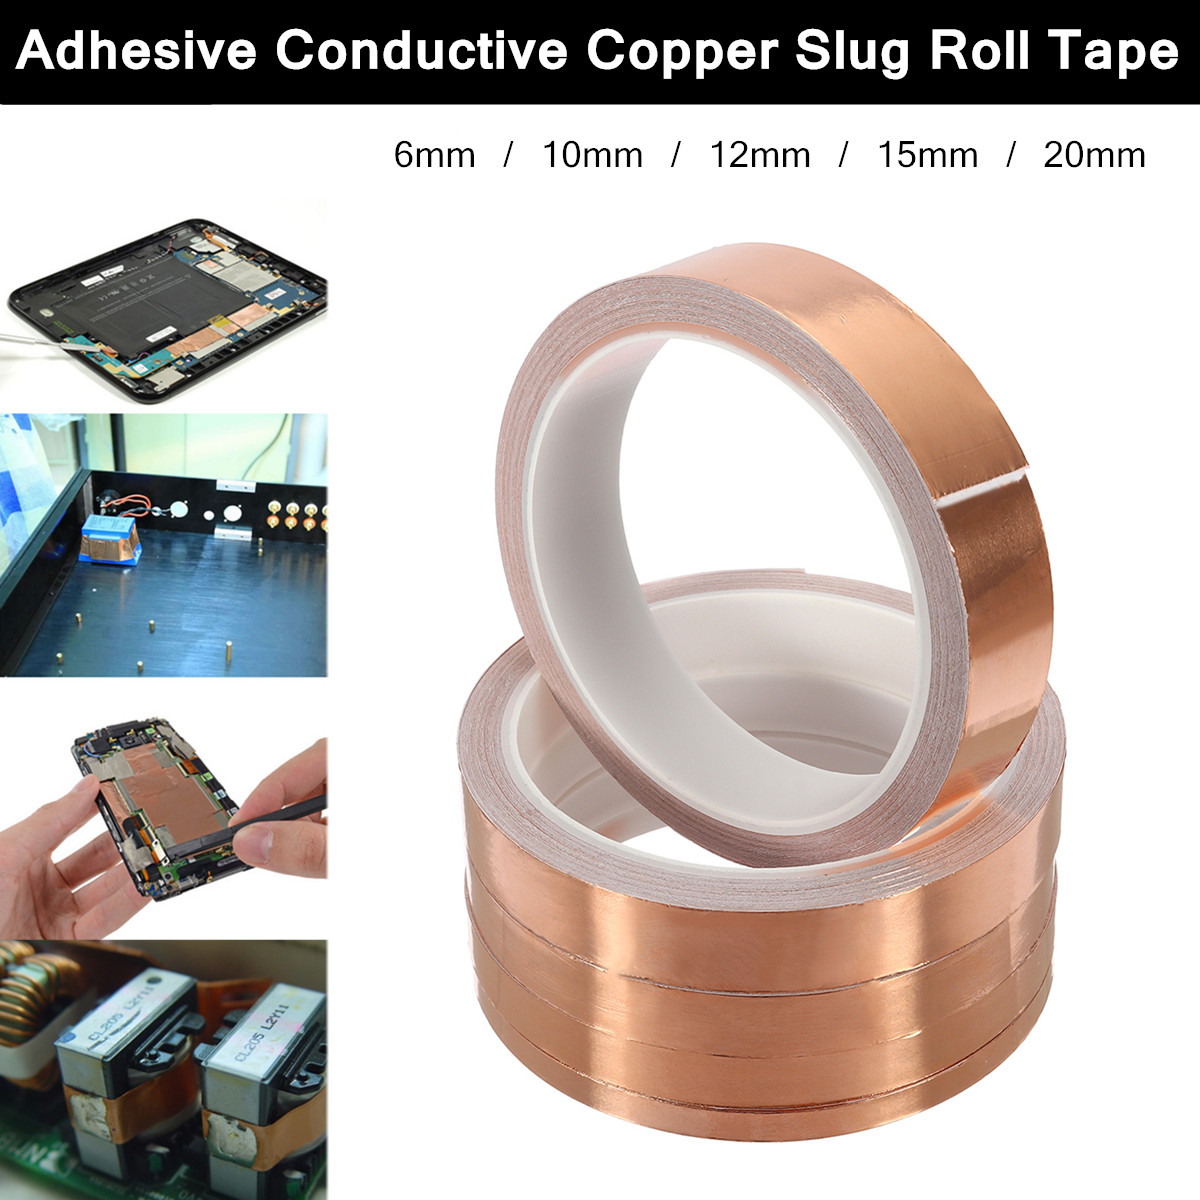 10/30M EMI Shield Eliminate EMI Anti-static Tape 6/10/12/15/20mm Single-sided Adhesive Conductive Copper Foil Tape Guitar Pickup10/30M EMI Shield Eliminate EMI Anti-static Tape 6/10/12/15/20mm Single-sided Adhesive Conductive Copper Foil Tape Guitar Pickup